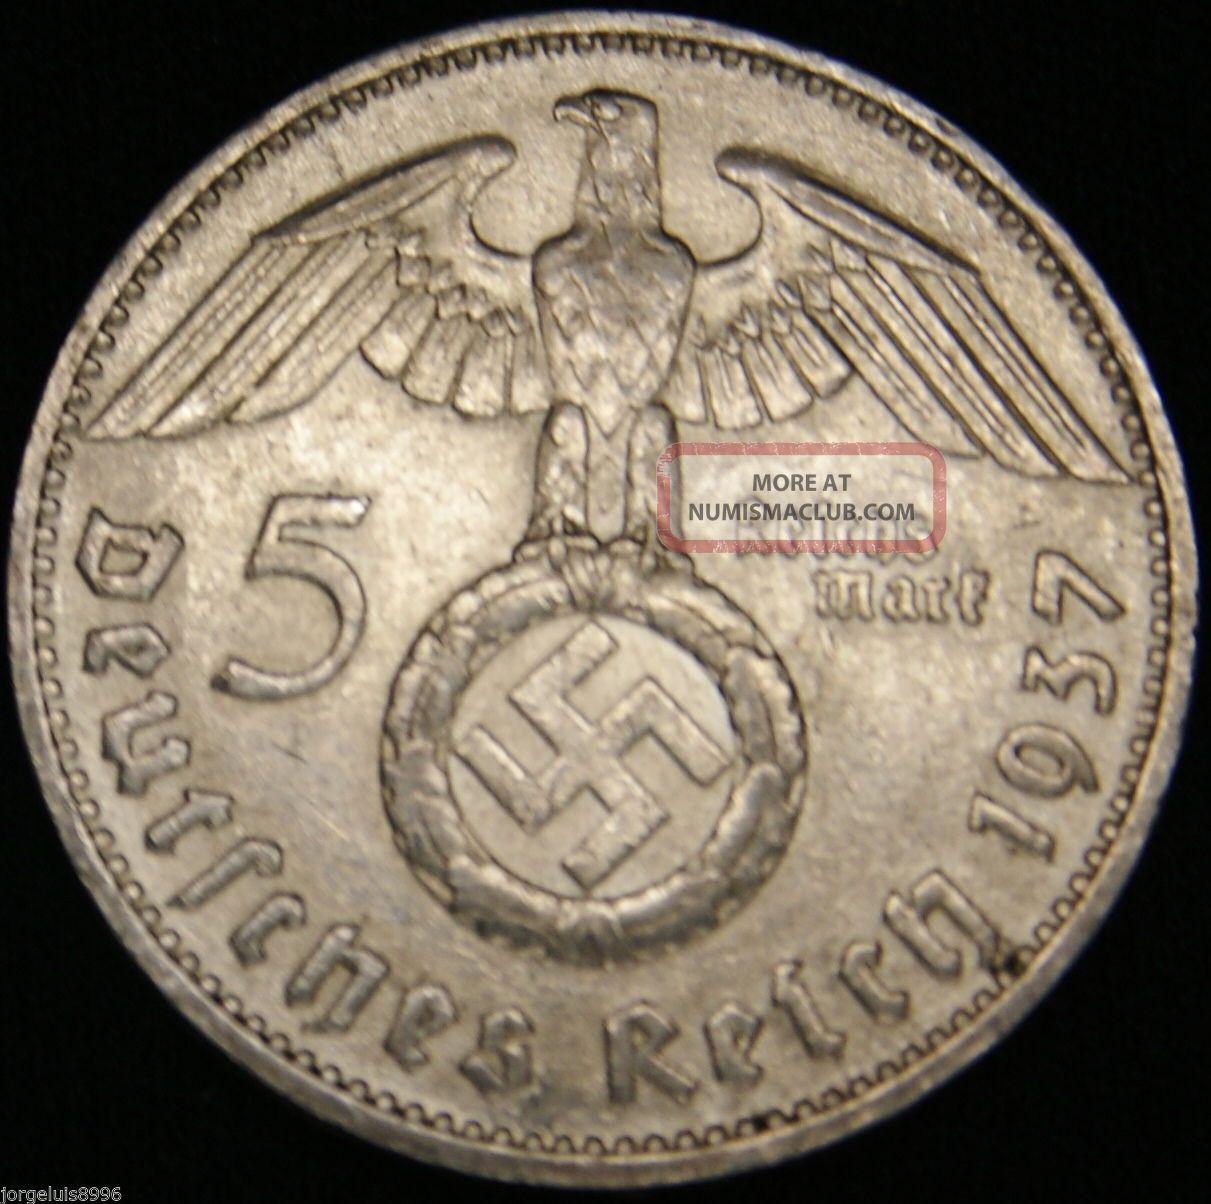 German Nazi Silver Coin 5 Rm 1937 D Big Swastika Germany photo